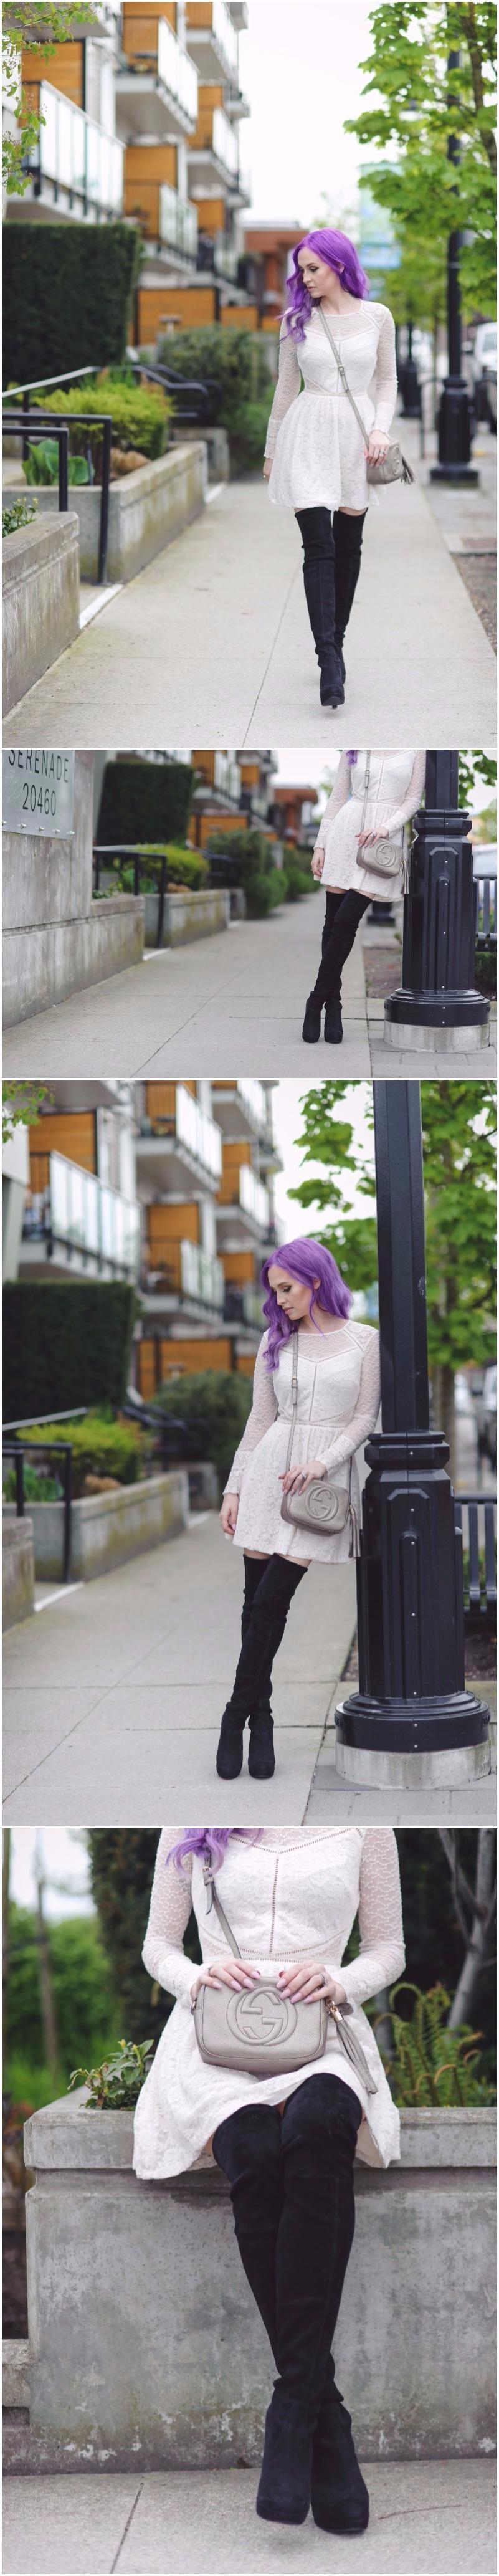 Untitled collage.jpg